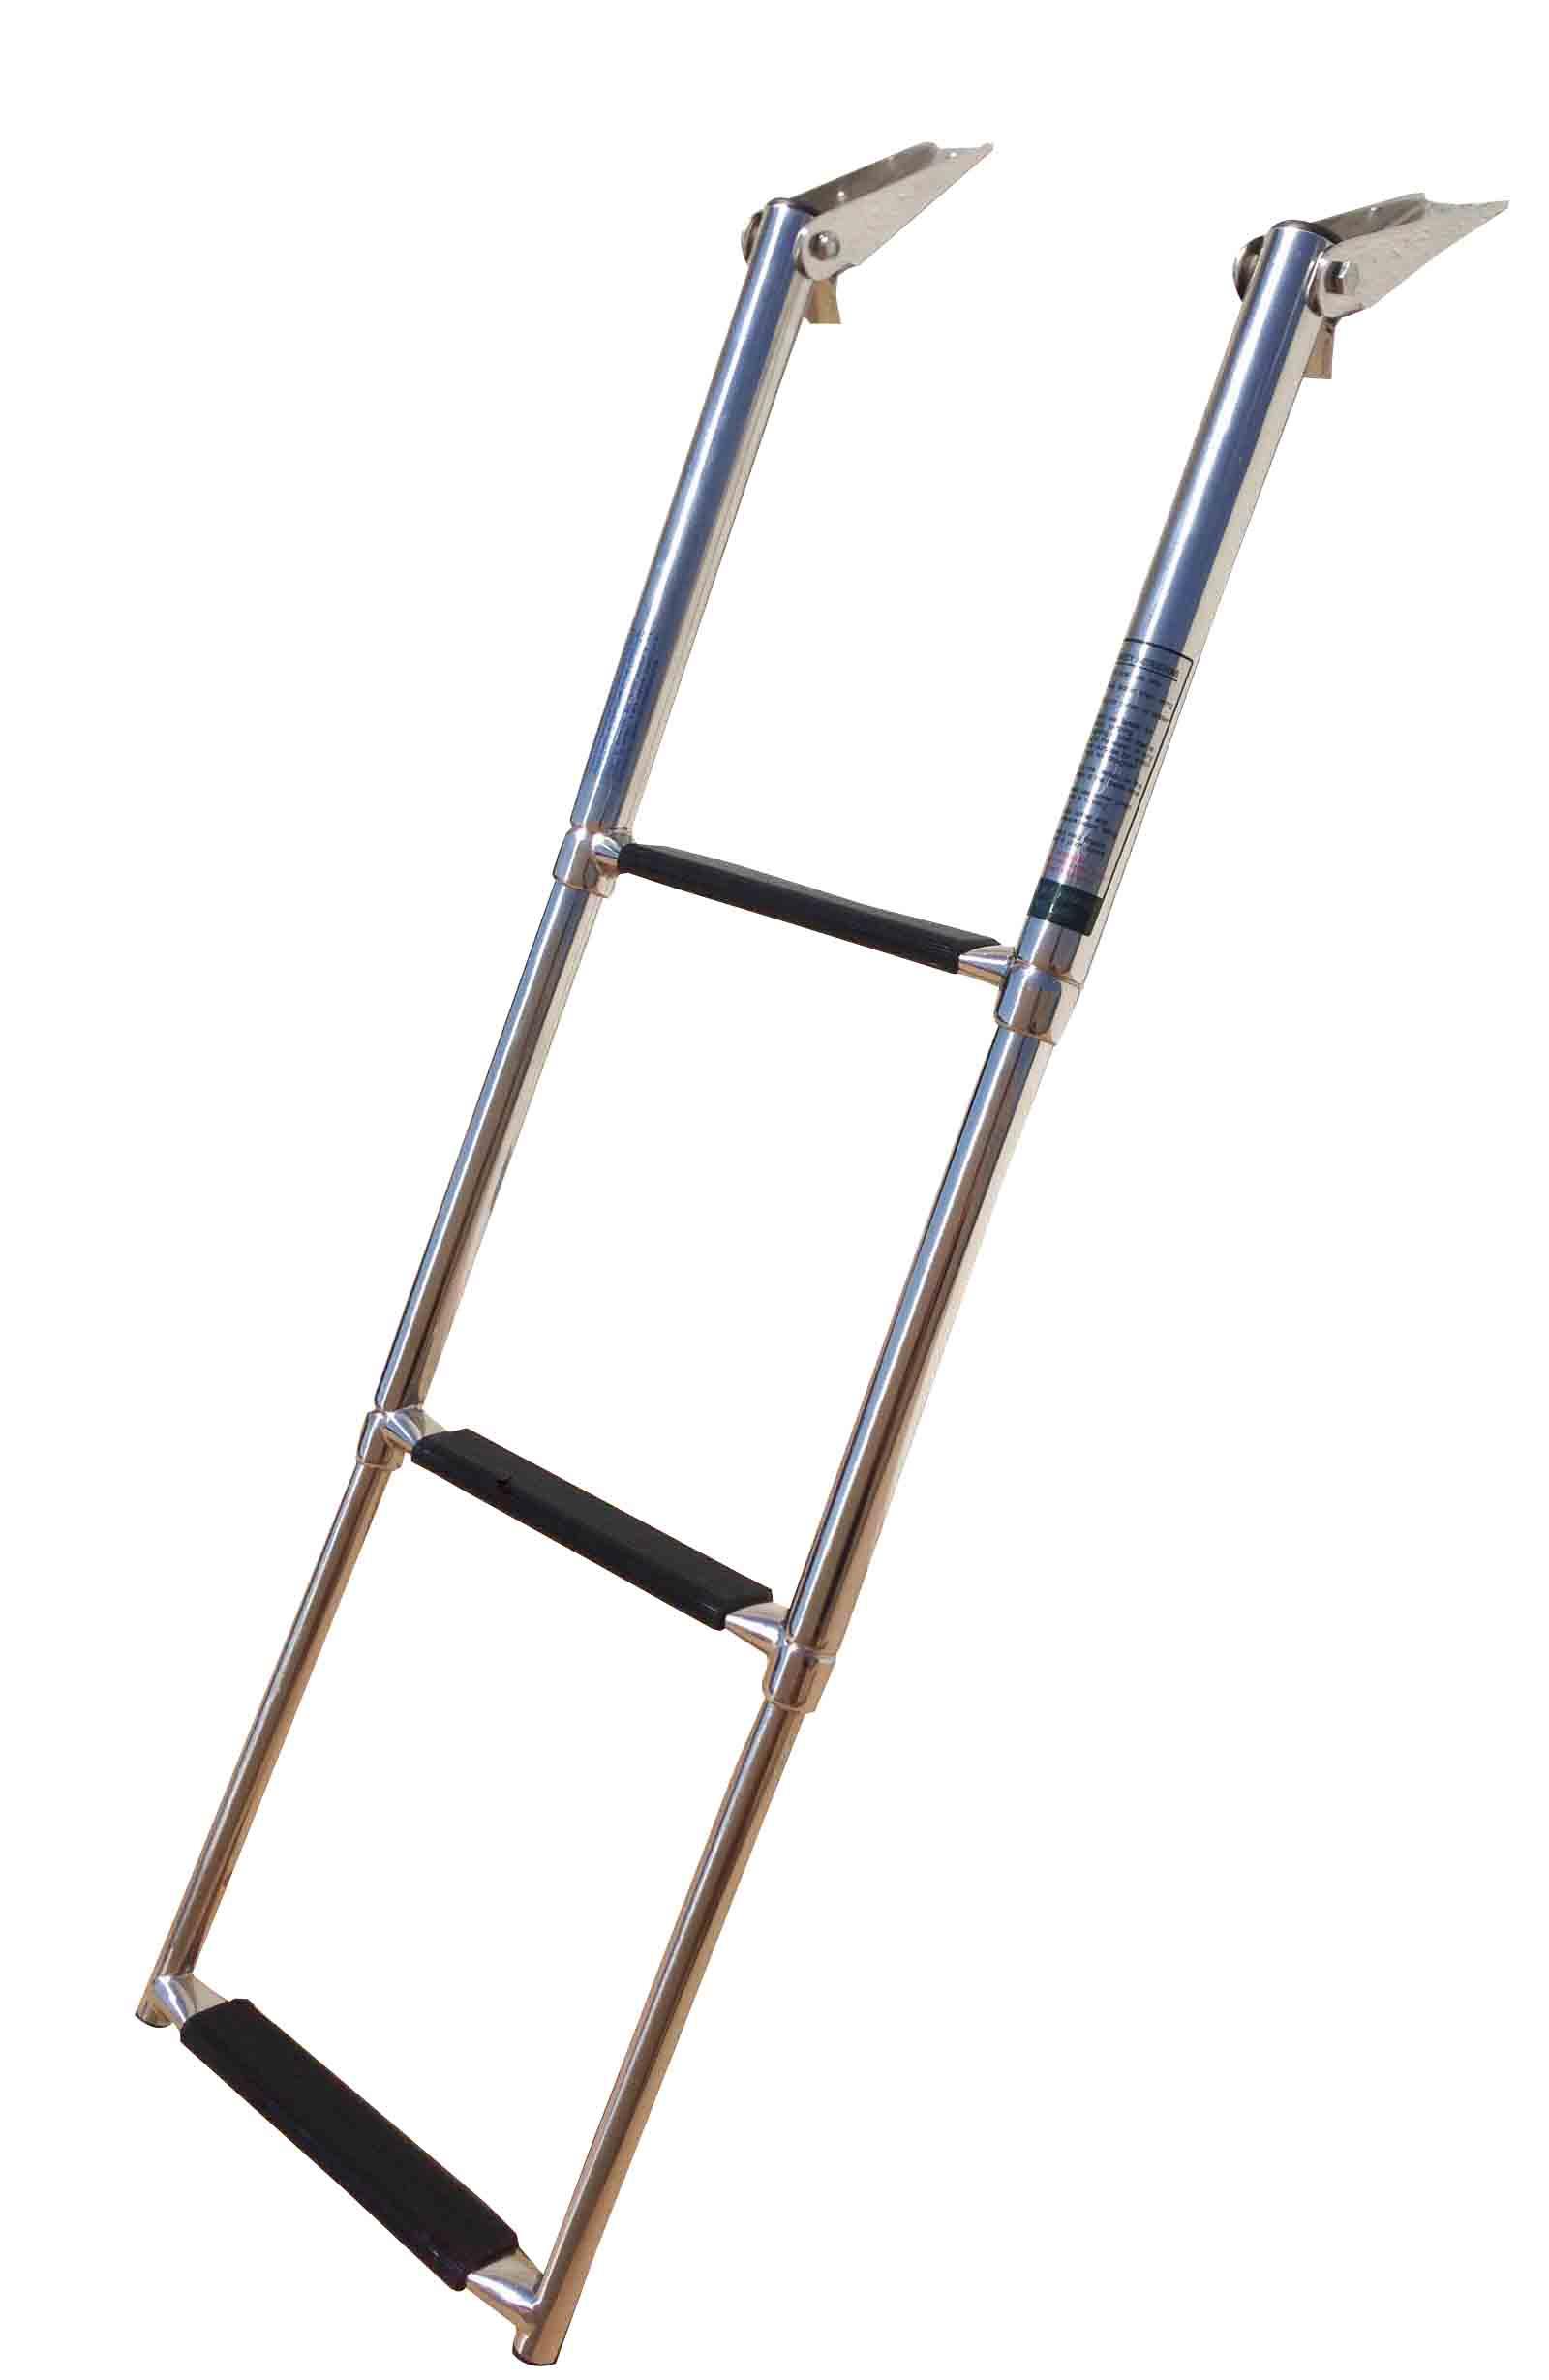 Marine Telescopic Ladder : Ladders marine and rv lighting accessories pactrade